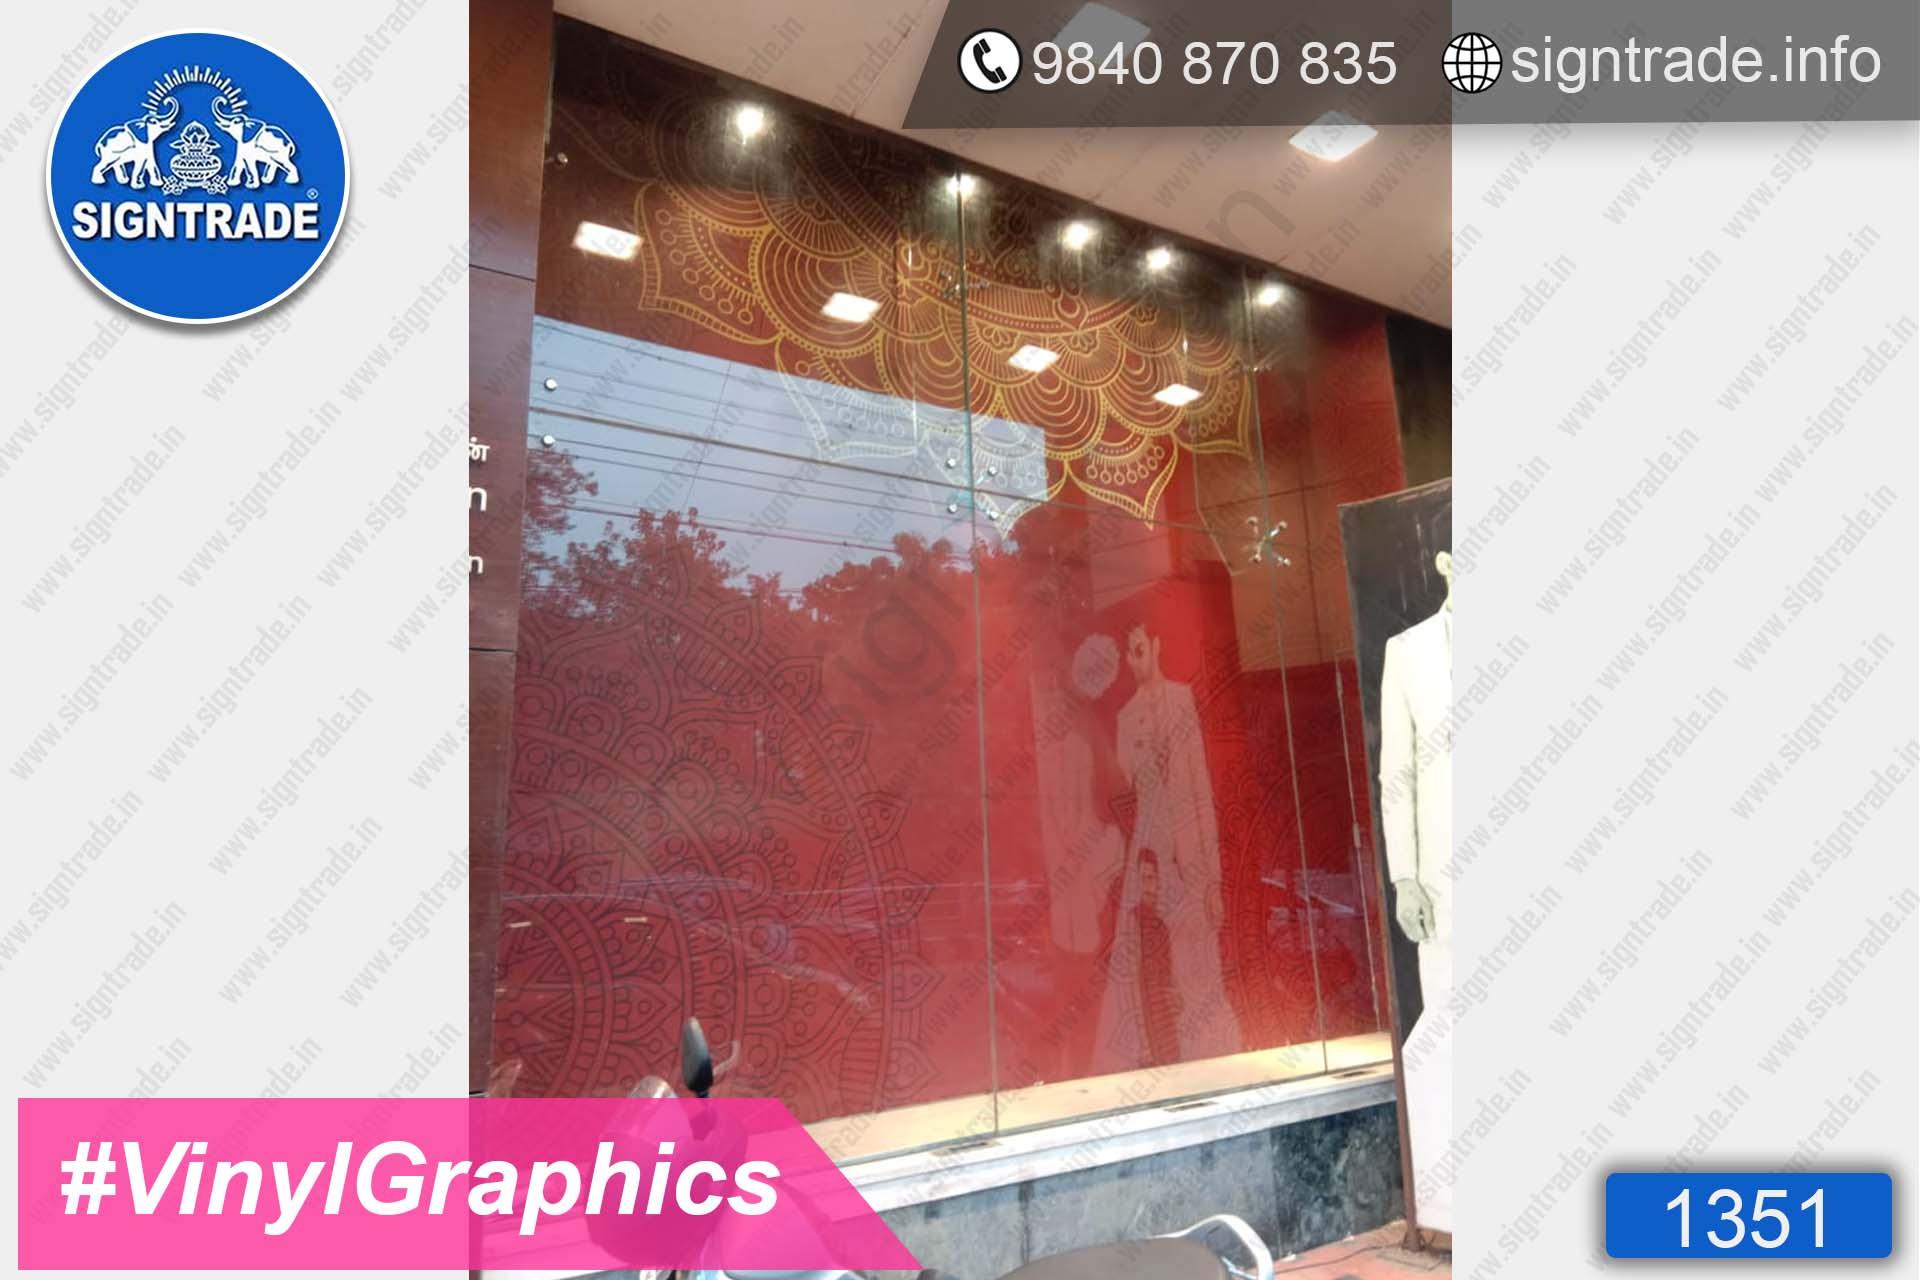 Jain collection - Vinyl Graphics on Wall